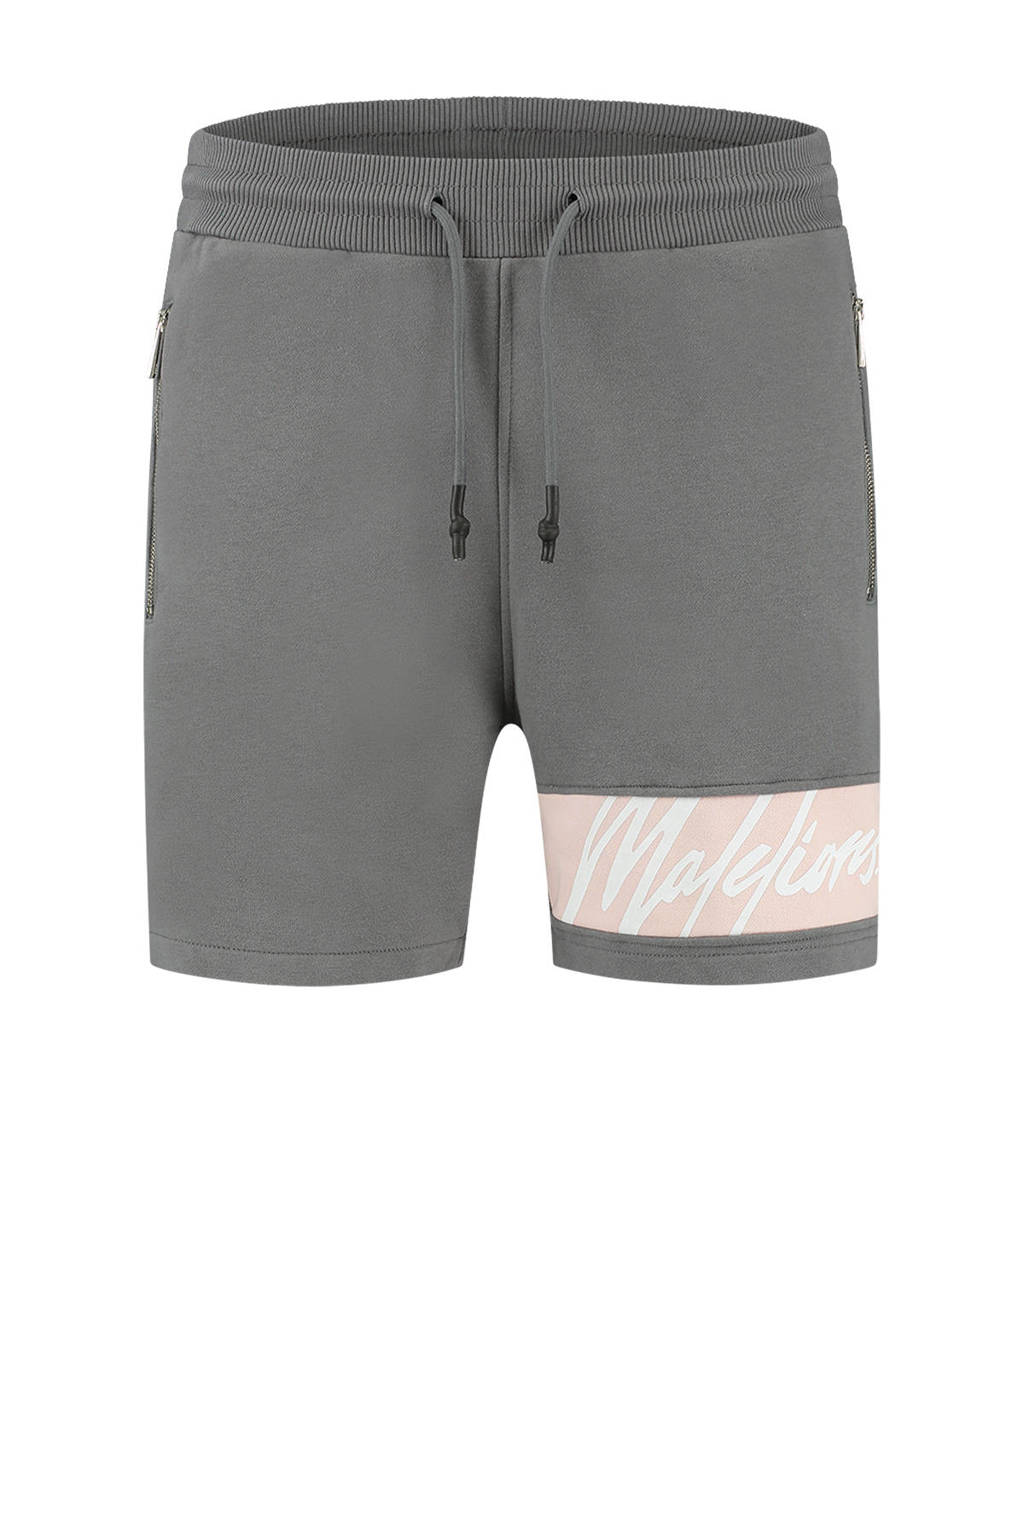 Malelions slim fit sweatshort met logo grijs/lichtroze, Grijs/lichtroze